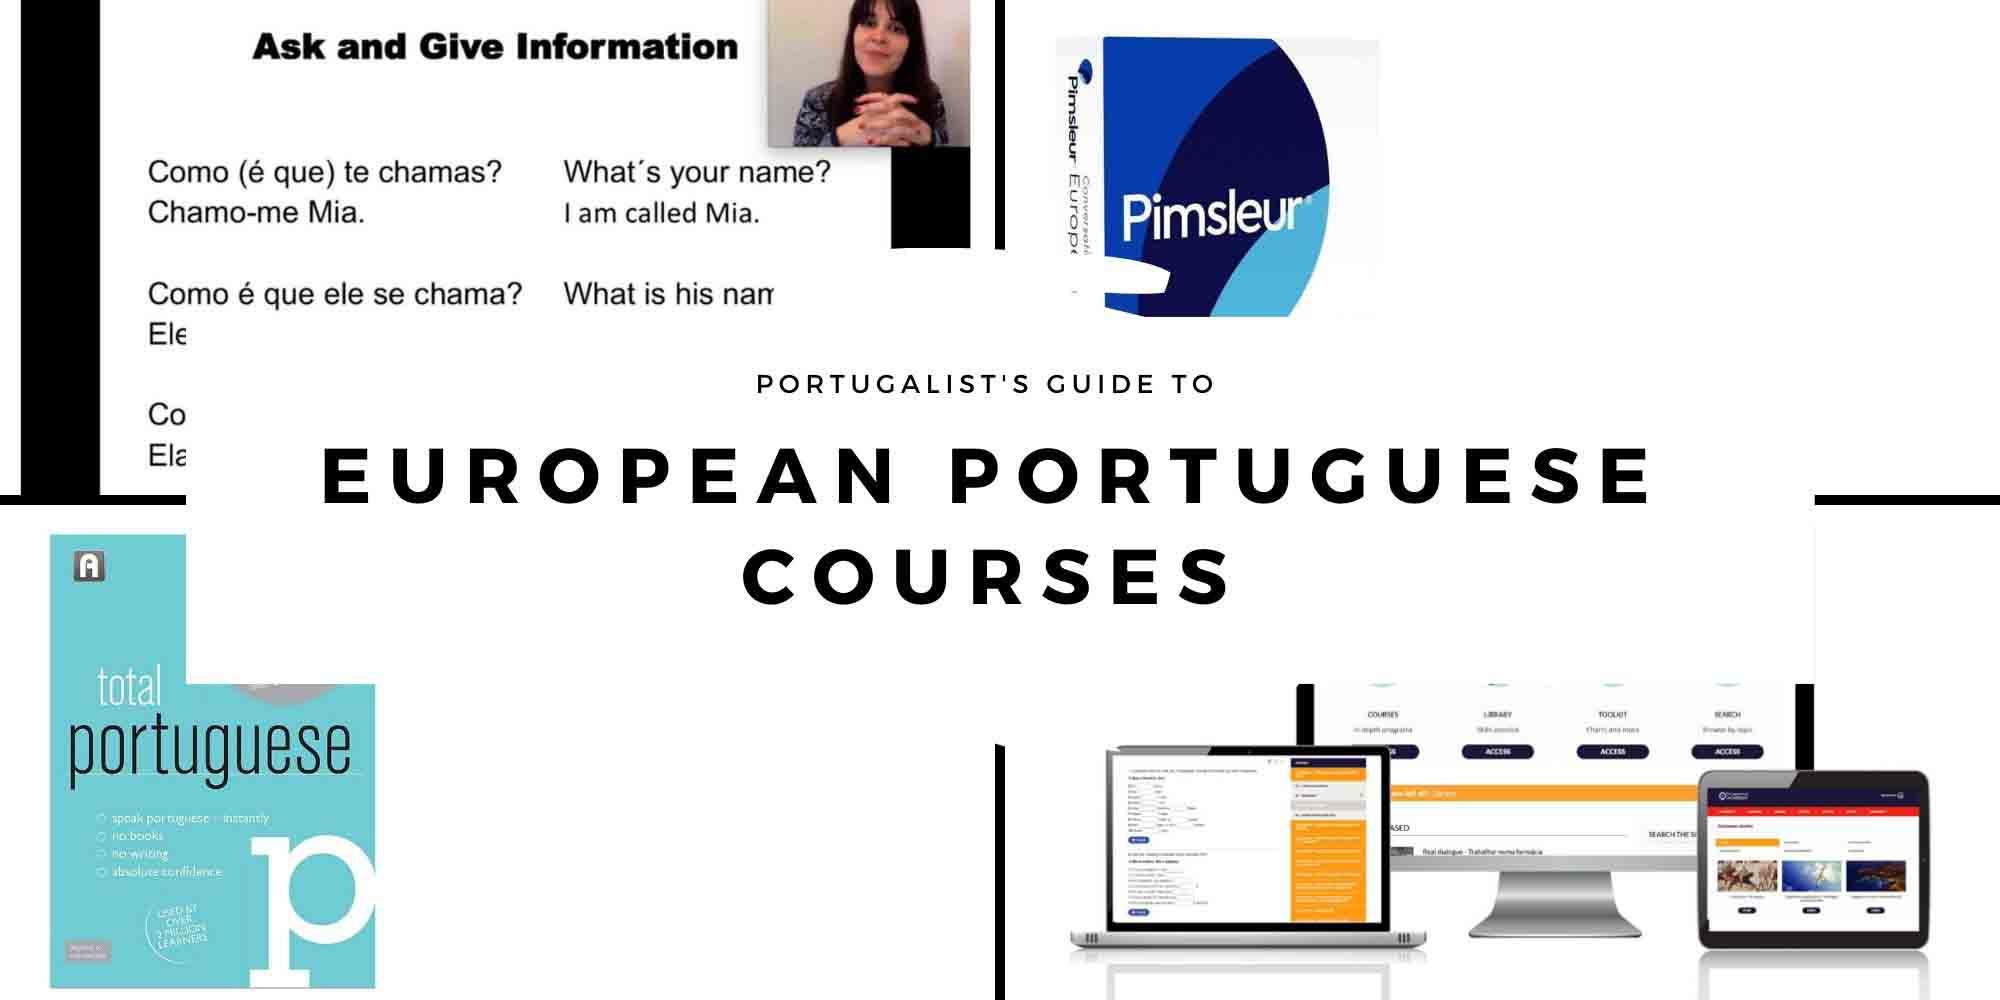 European Portuguese Courses Header